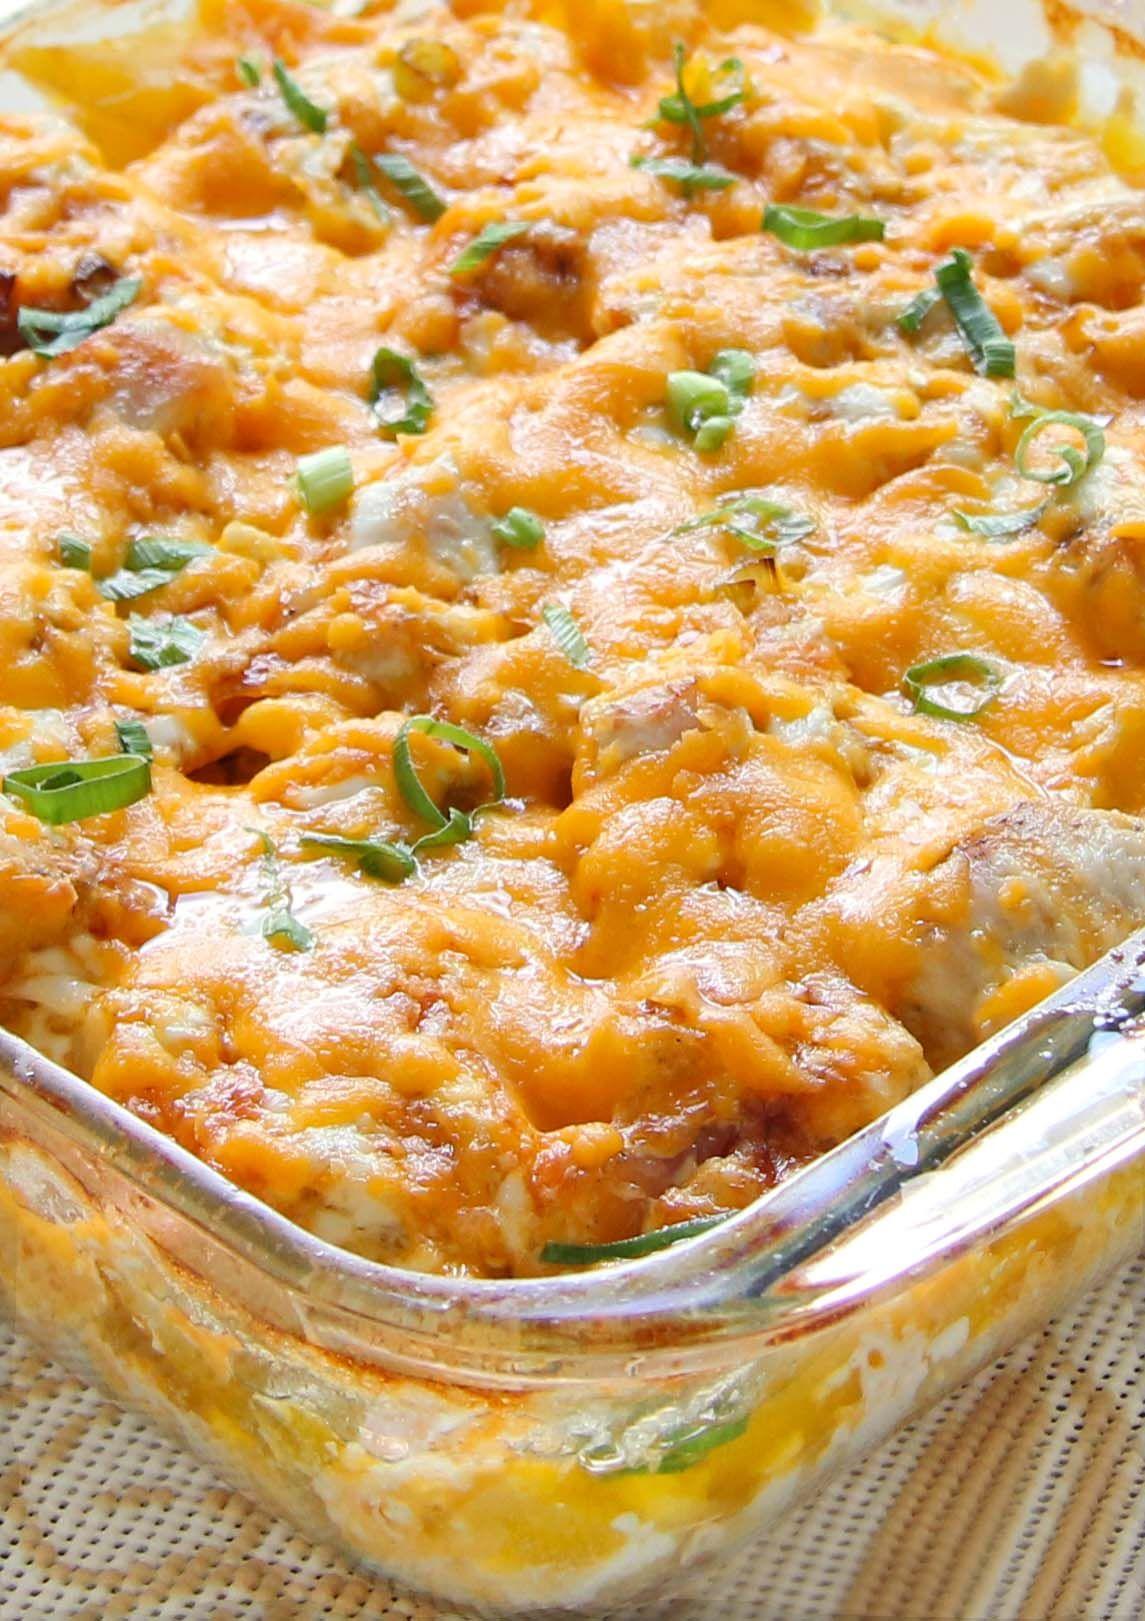 Best 25 Casseroles Ideas On Pinterest Casserole Kitchen